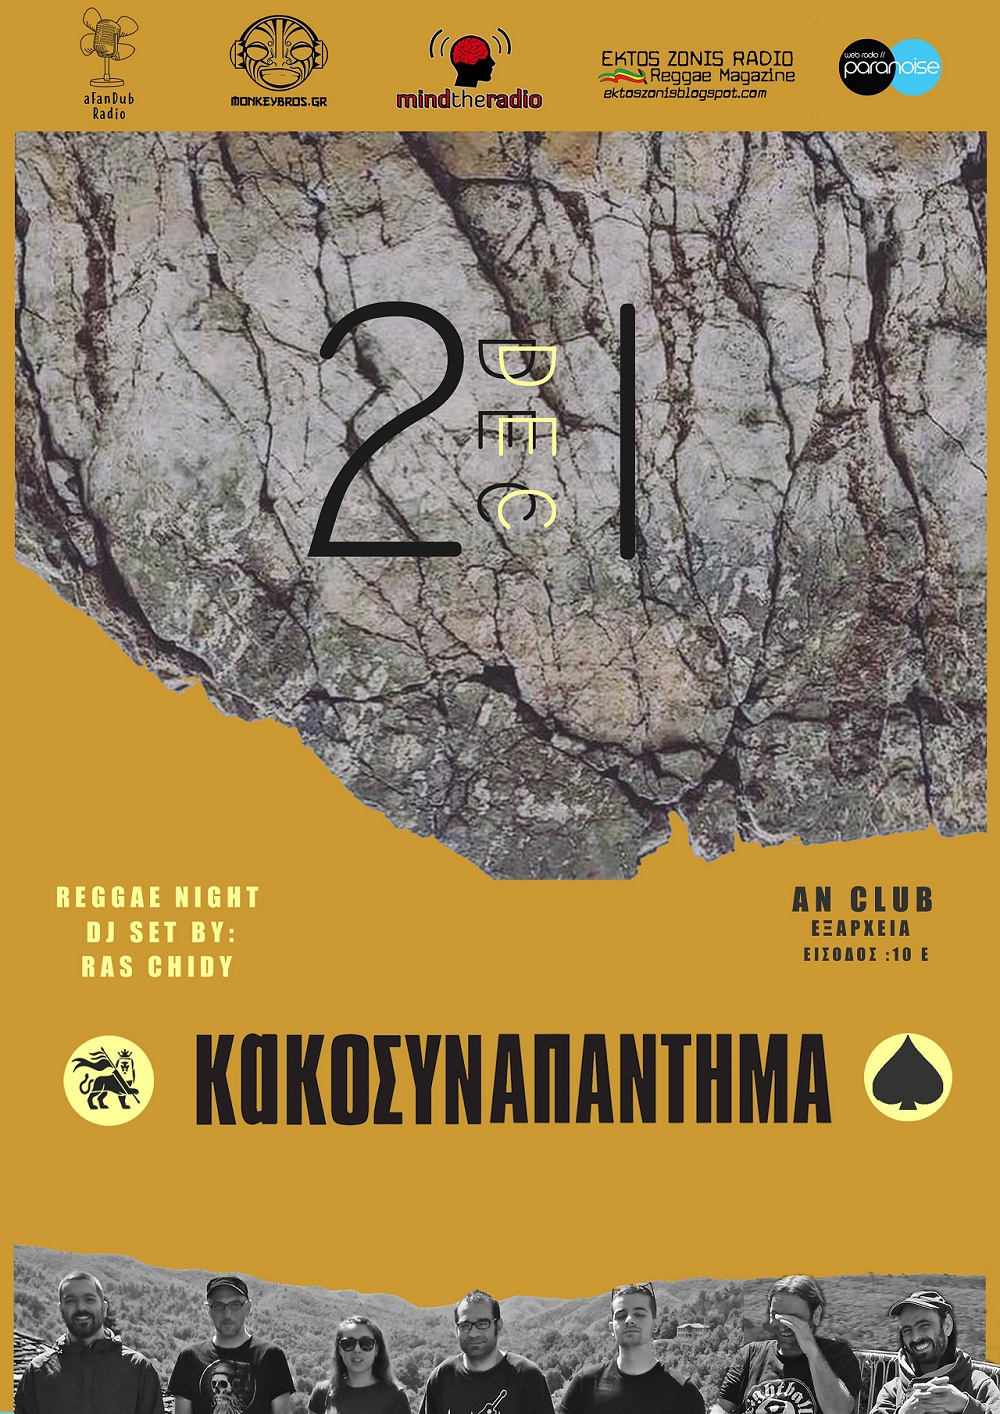 Kako Sinapantima 21-12-19 poster